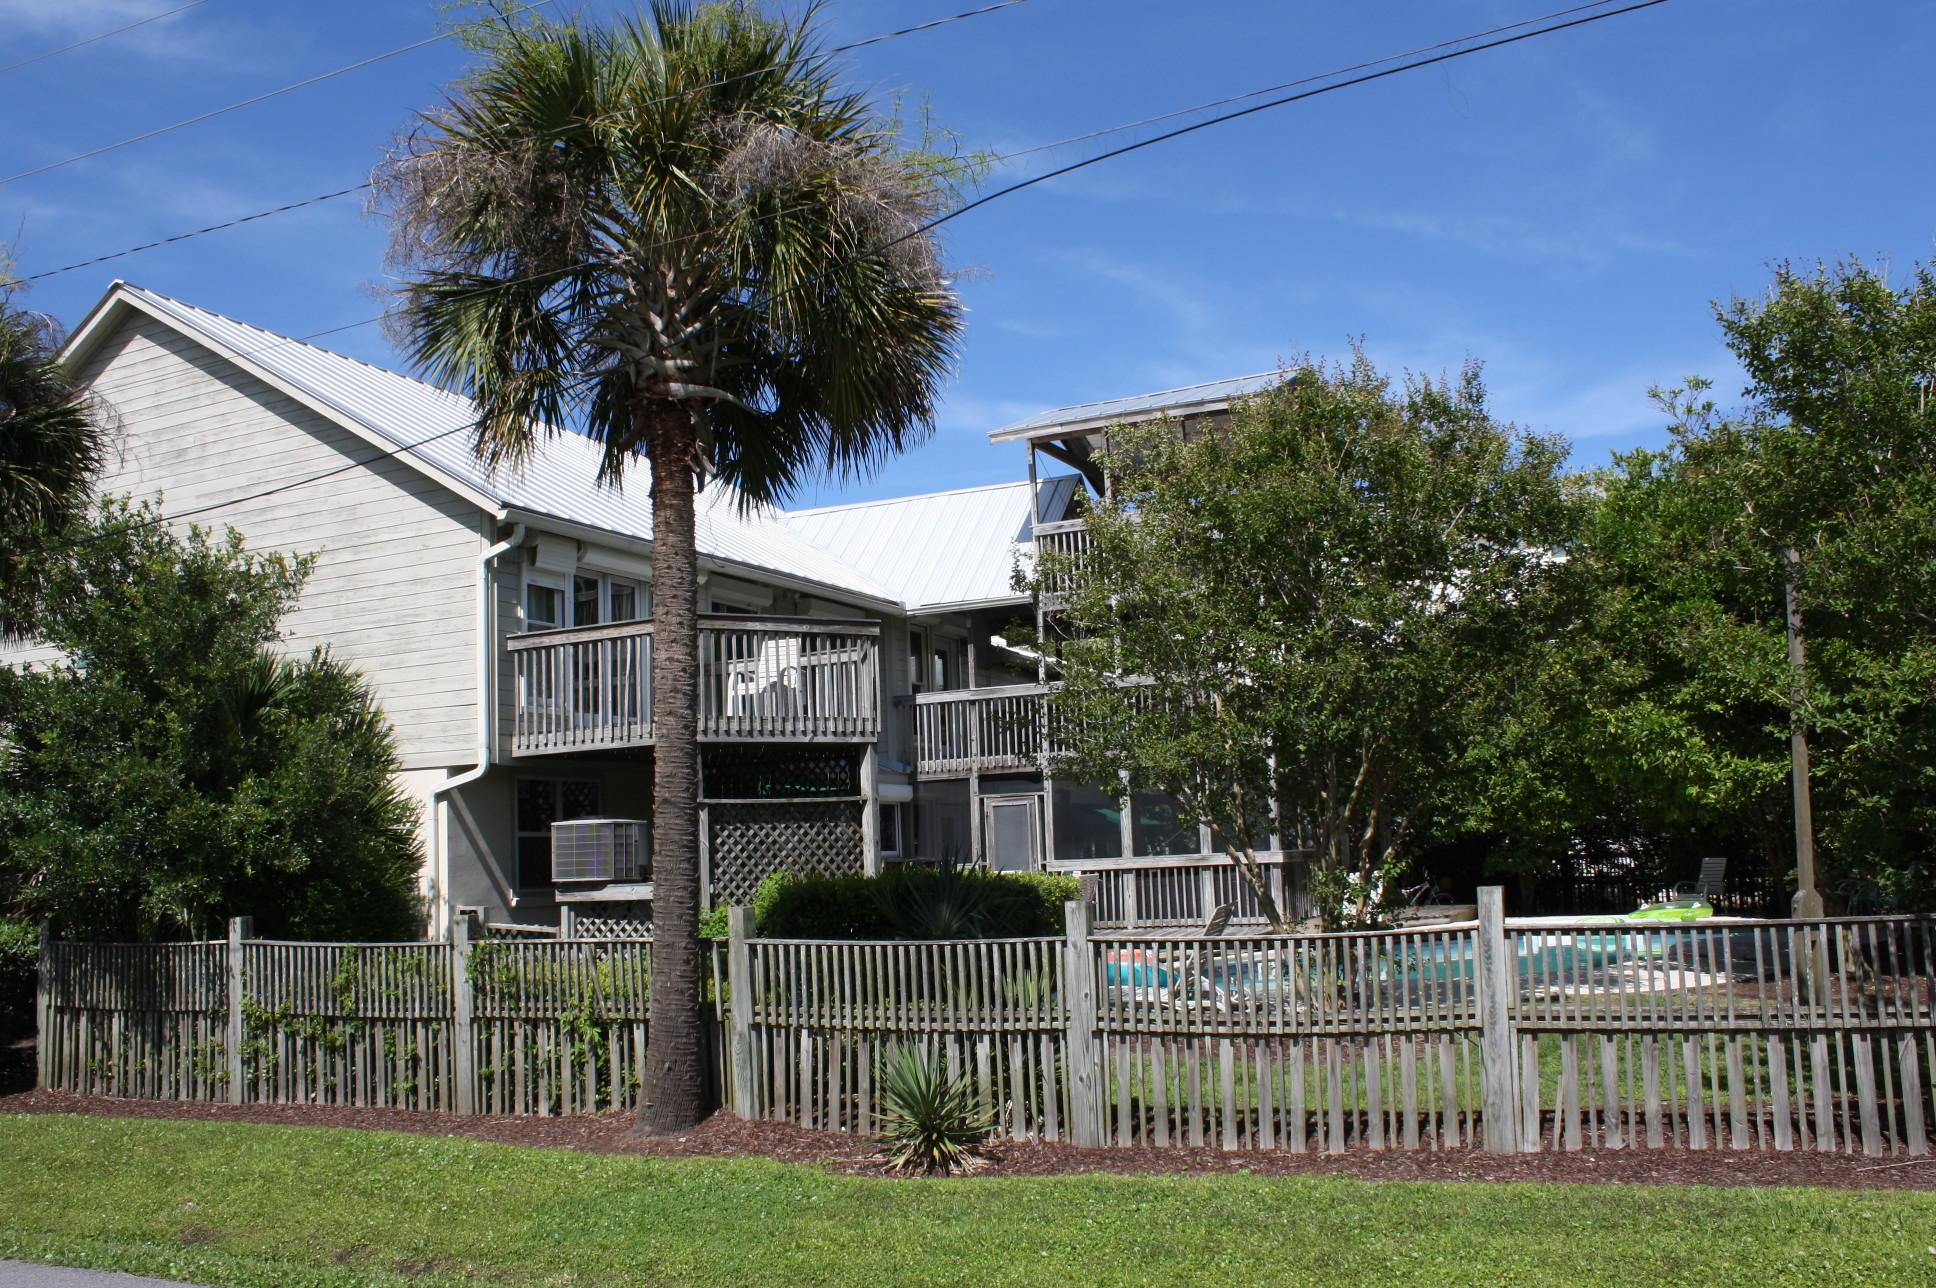 Sullivans Island Homes For Sale - 1601 Poe, Sullivans Island, SC - 18